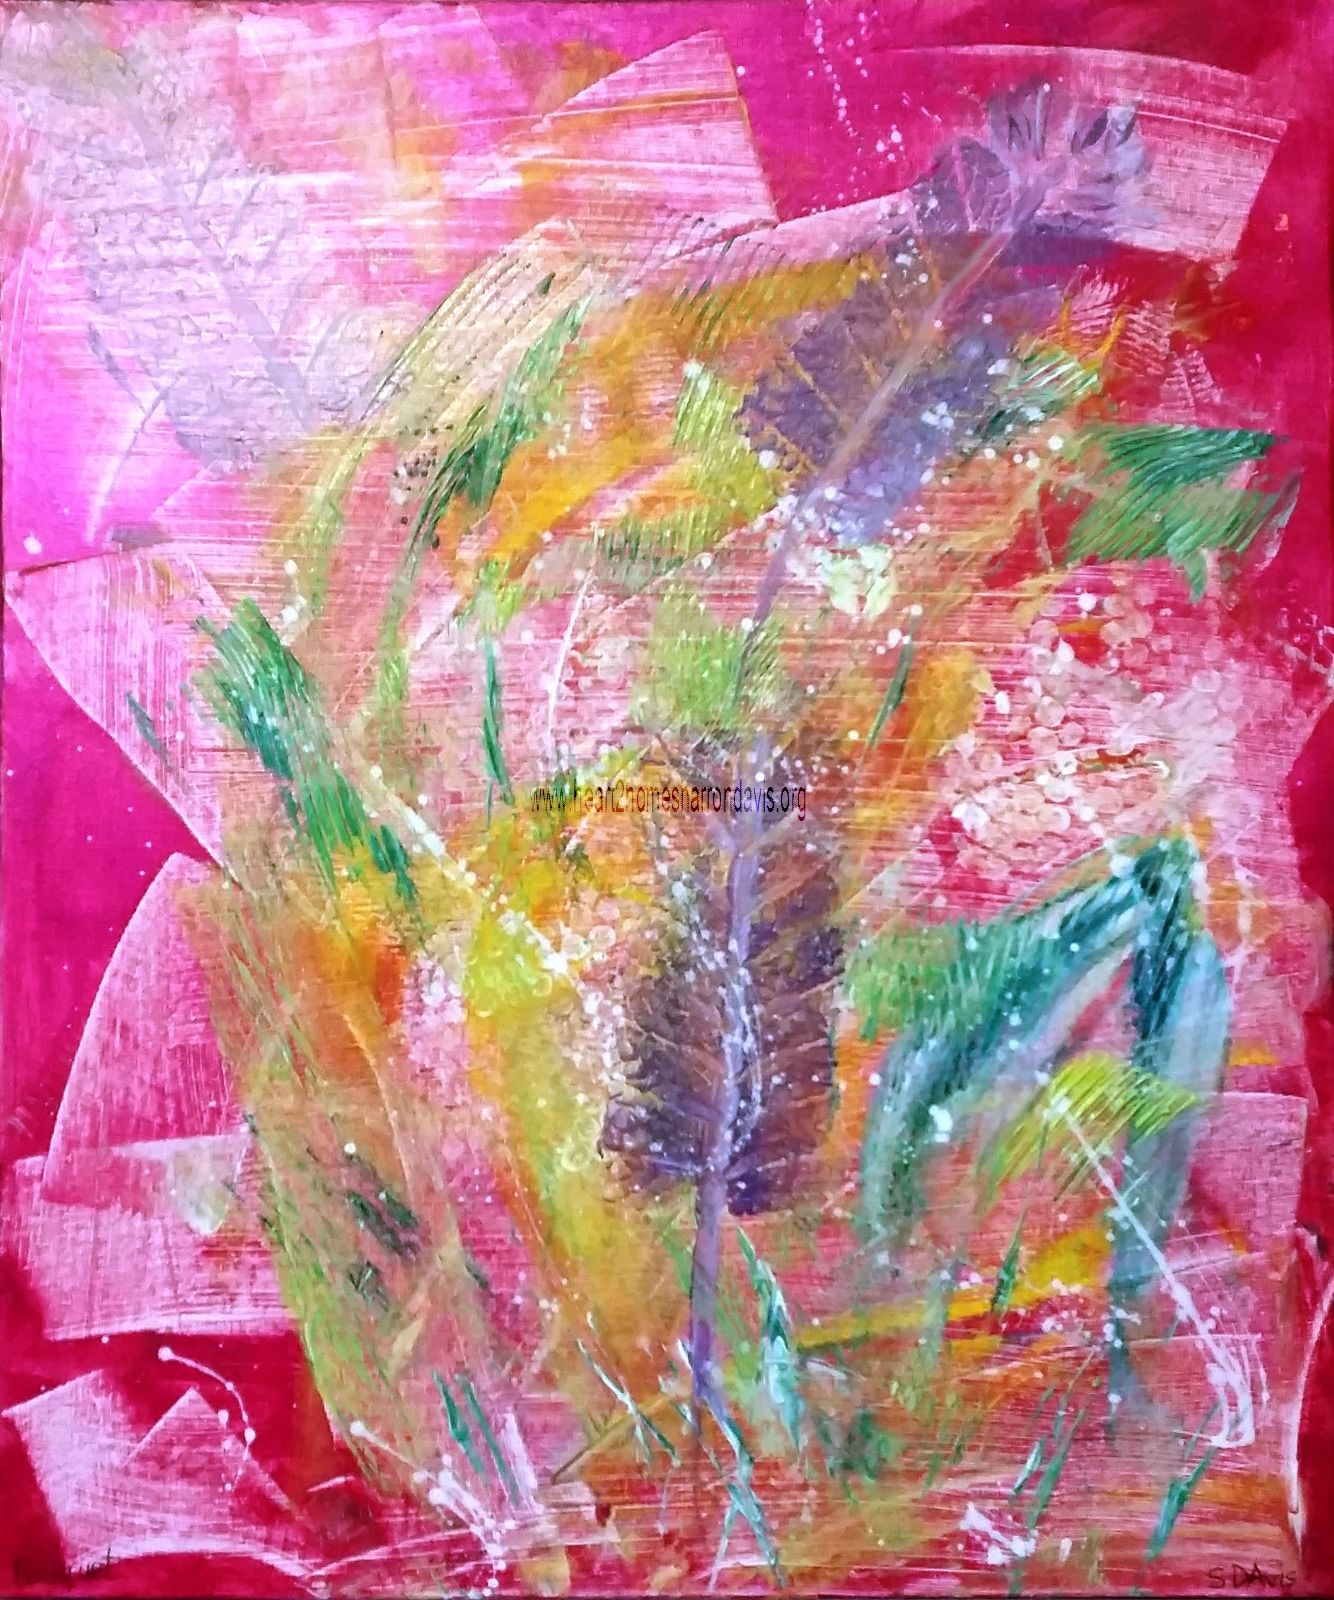 Name - BOUQUET 50cm x 60cm AU$250.00 Acrylic Abstract with Metallic Fuschia Background